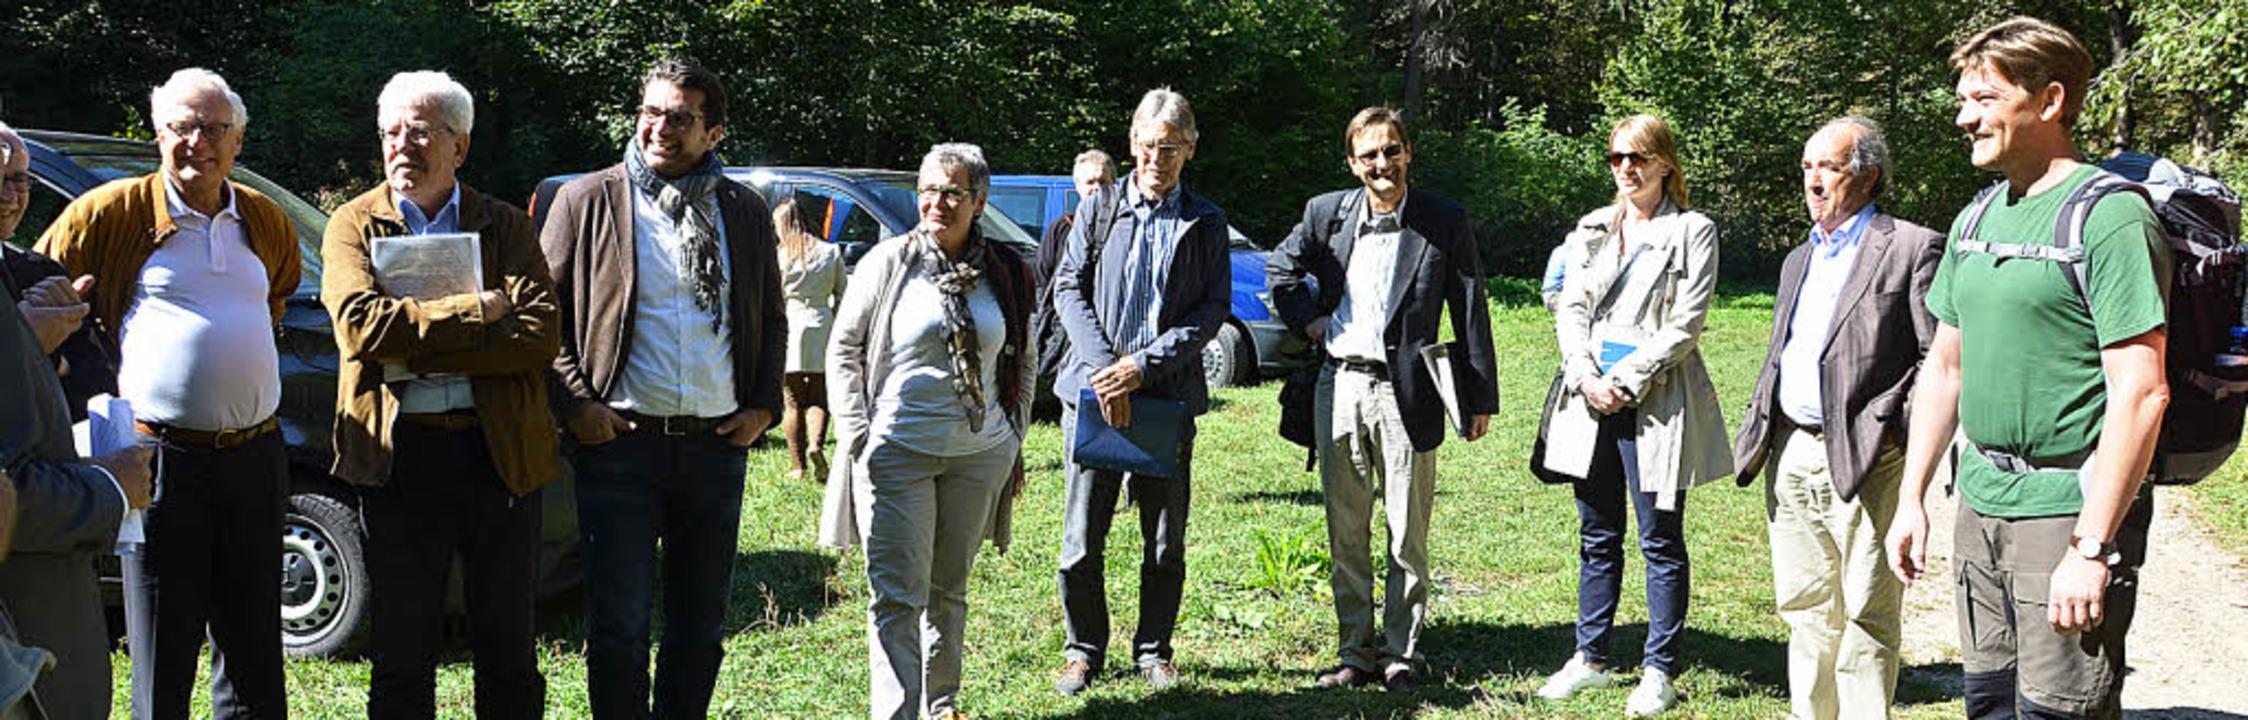 Jesuitenpater Clemens Blattert (rechts...u der Delegation in Bad Boll gestoßen.    Foto: Juliane Kühnemund